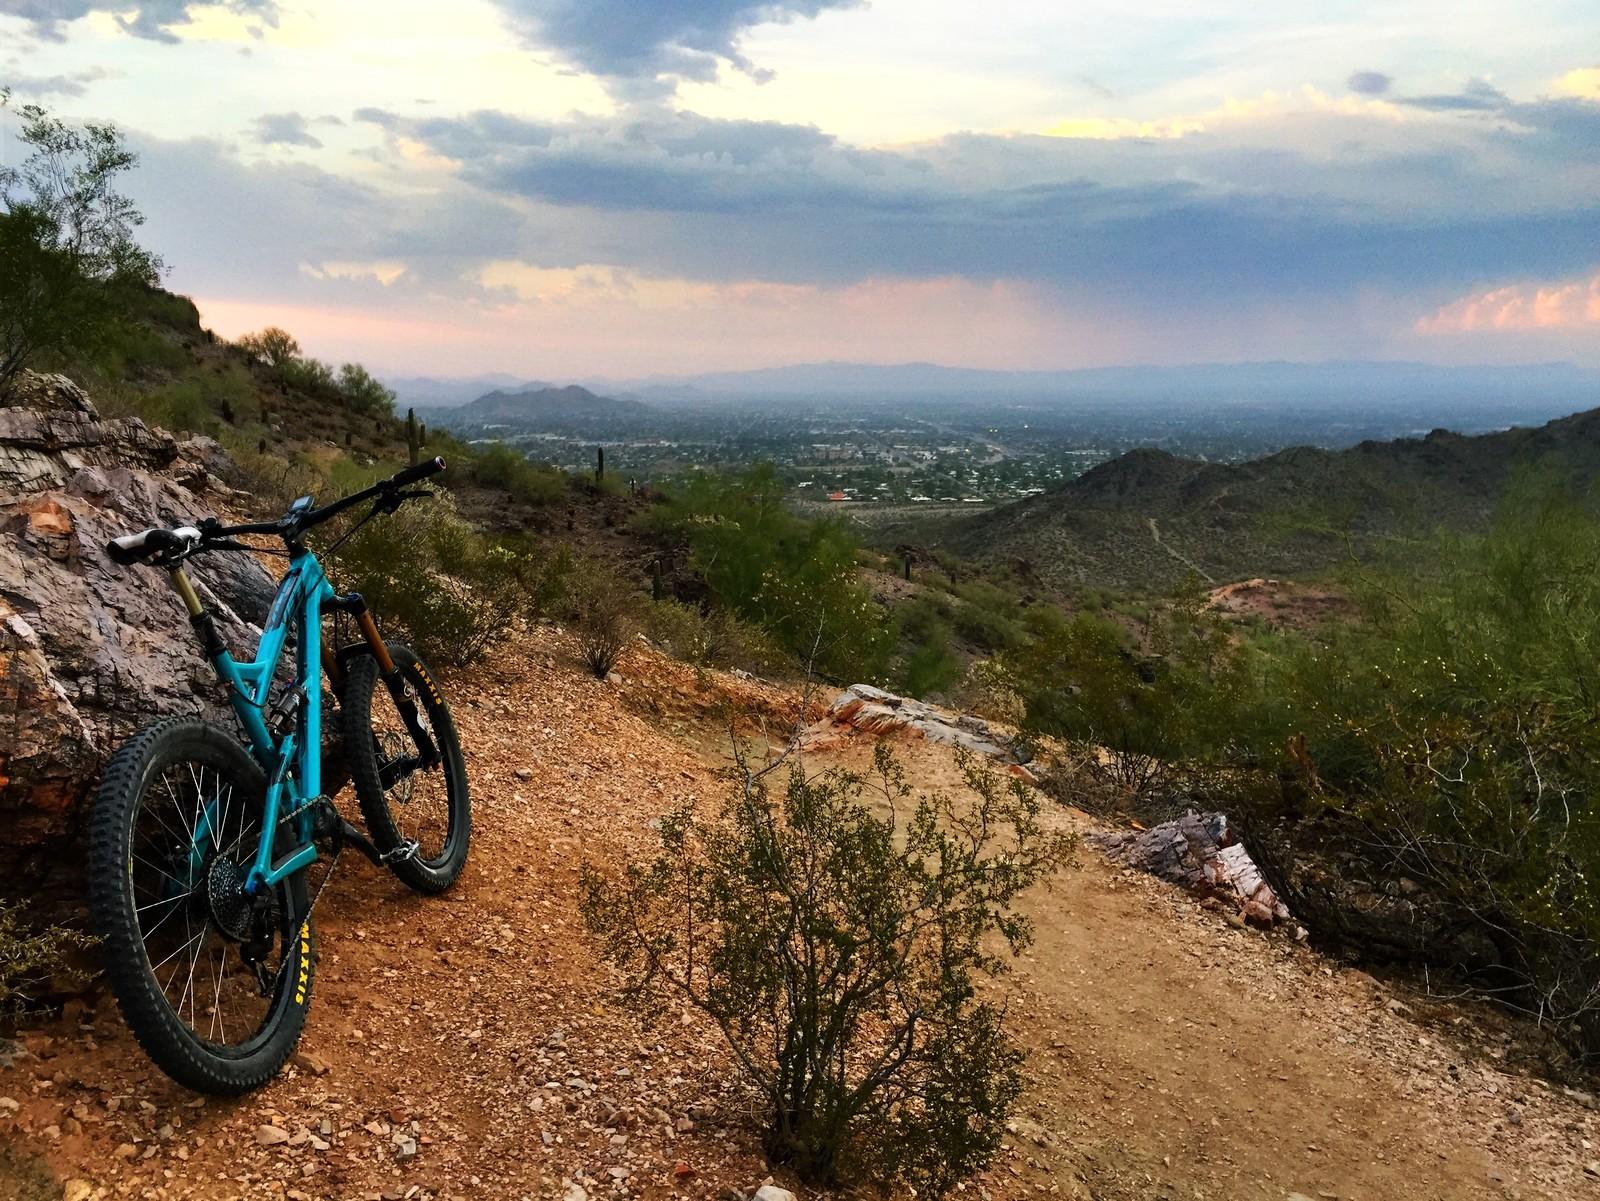 The former trail bike - SB66a - azmtbr - Mountain Biking Pictures - Vital MTB